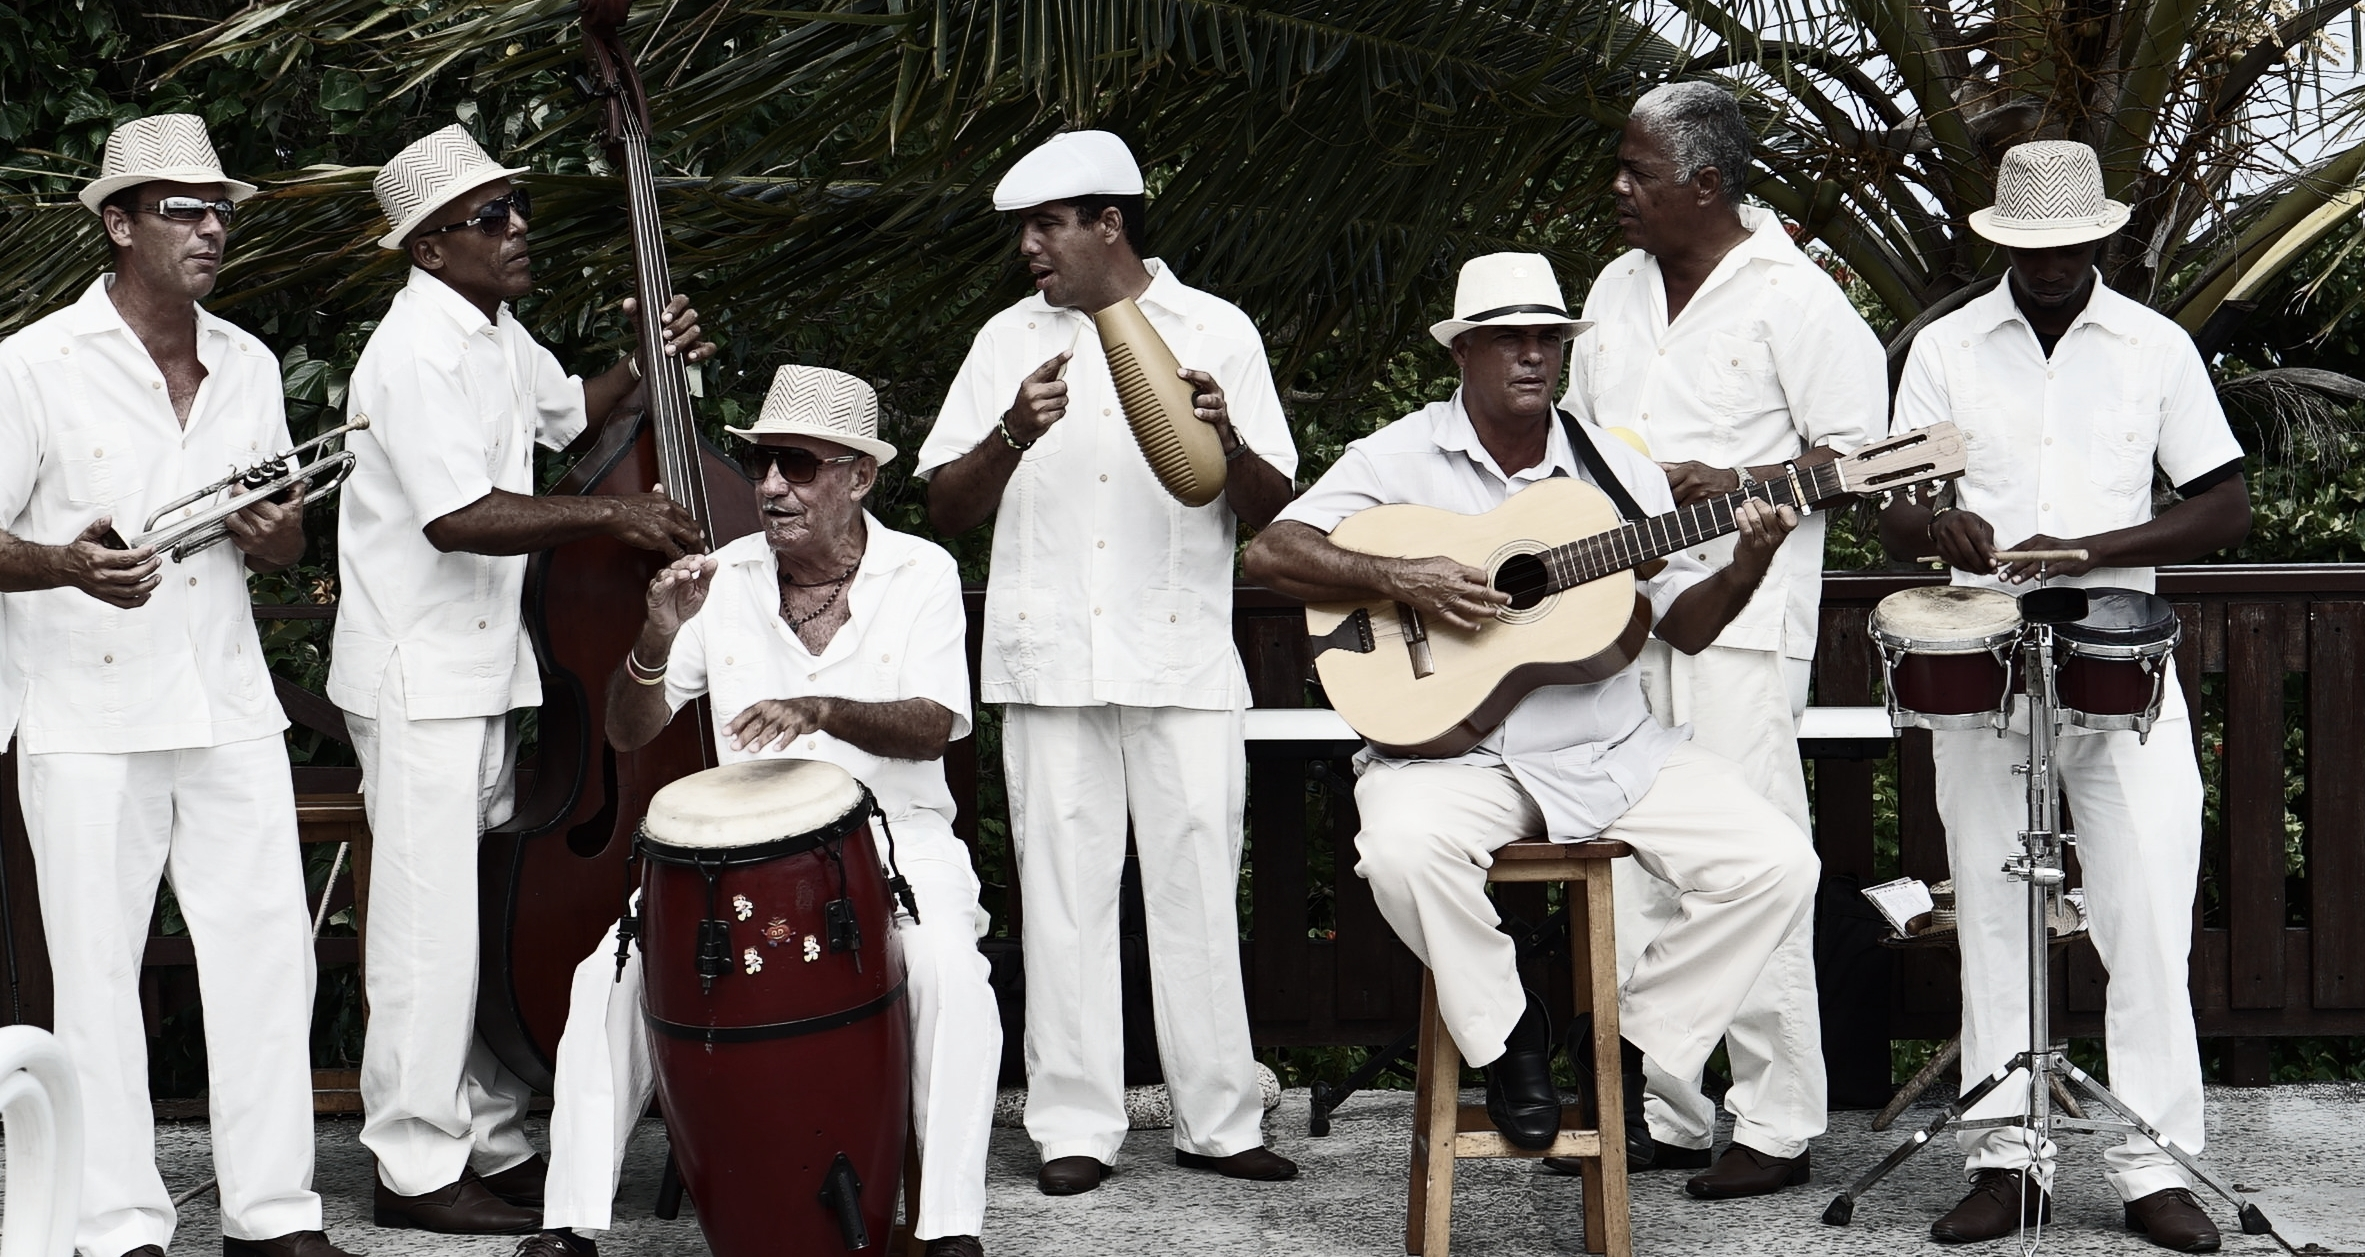 Bianca Jeanty Visits Cuba - Travel - Culture